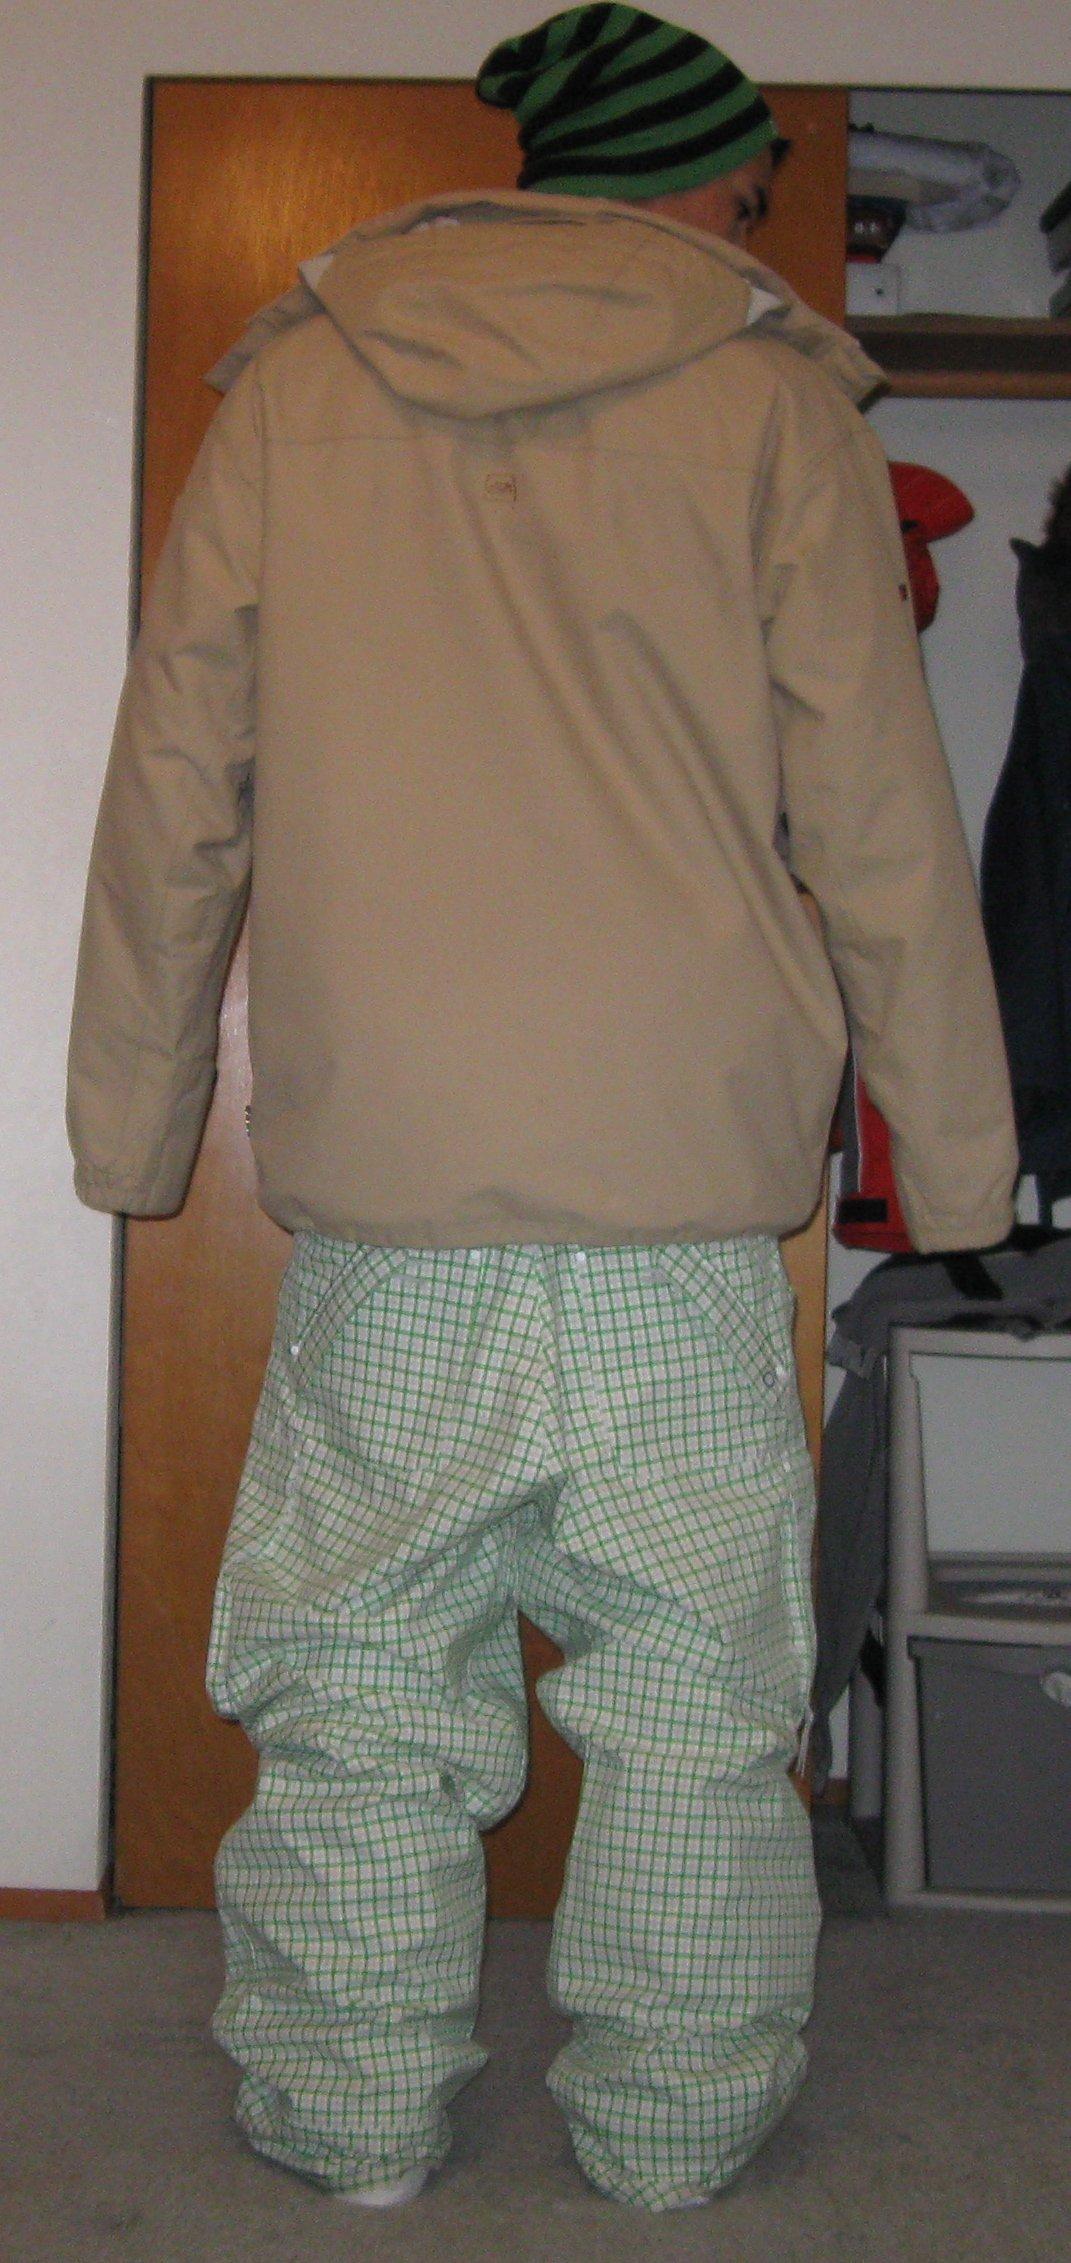 XXL 686 Smarty Troop 3-in-1 Jacket w/ XL Special Blend Annex pant